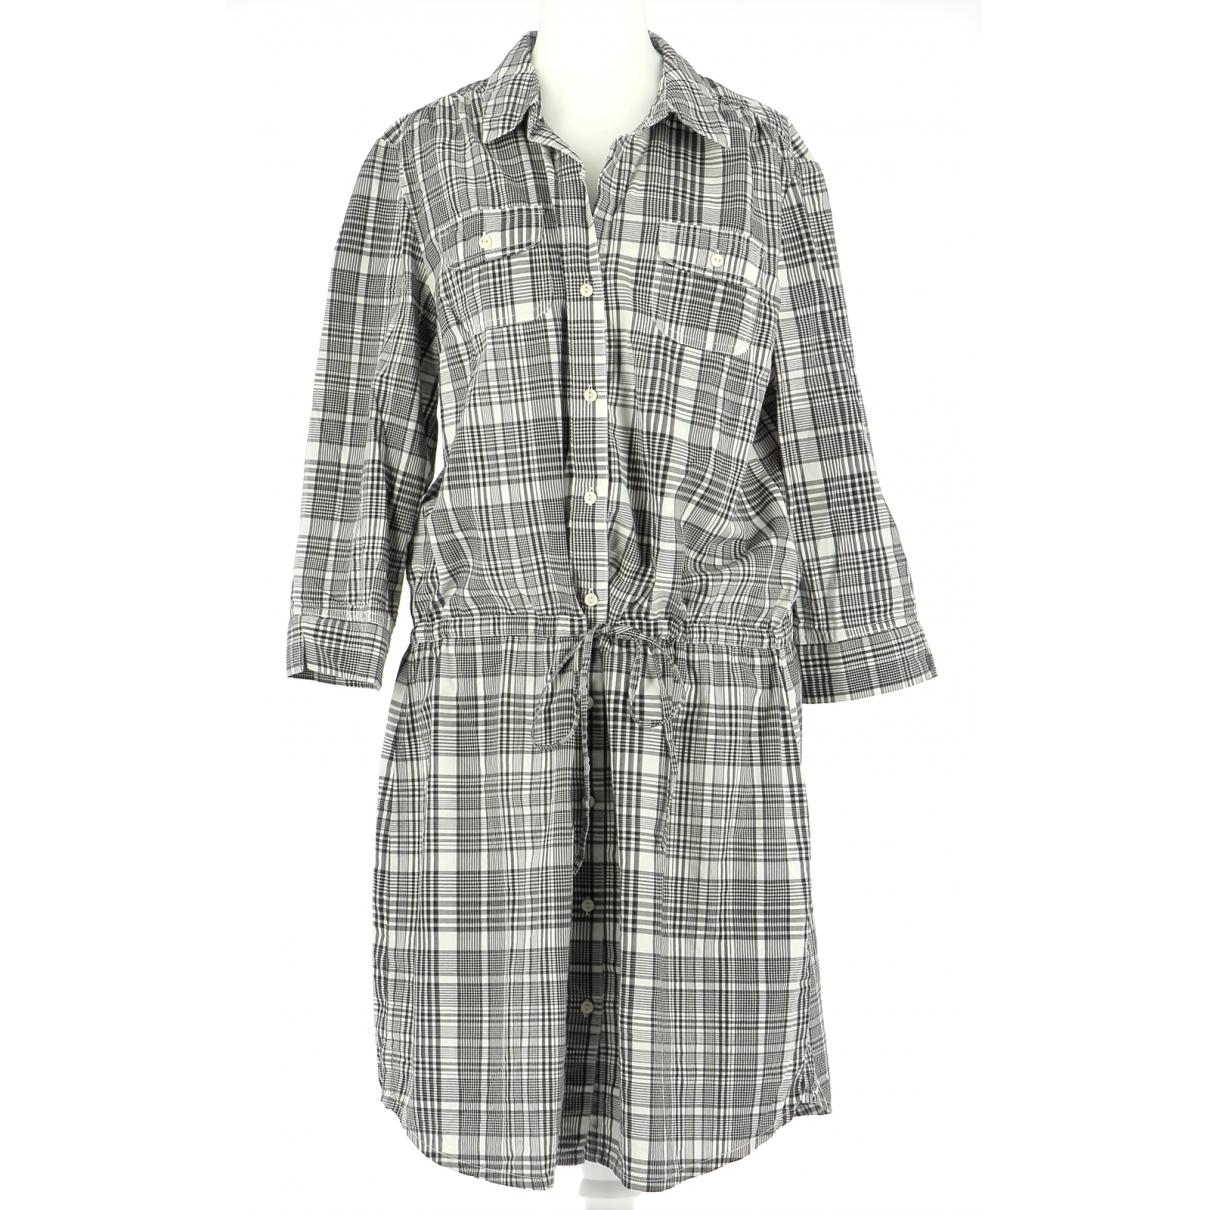 Tommy Hilfiger N Grey Cotton dress for Women 40 FR